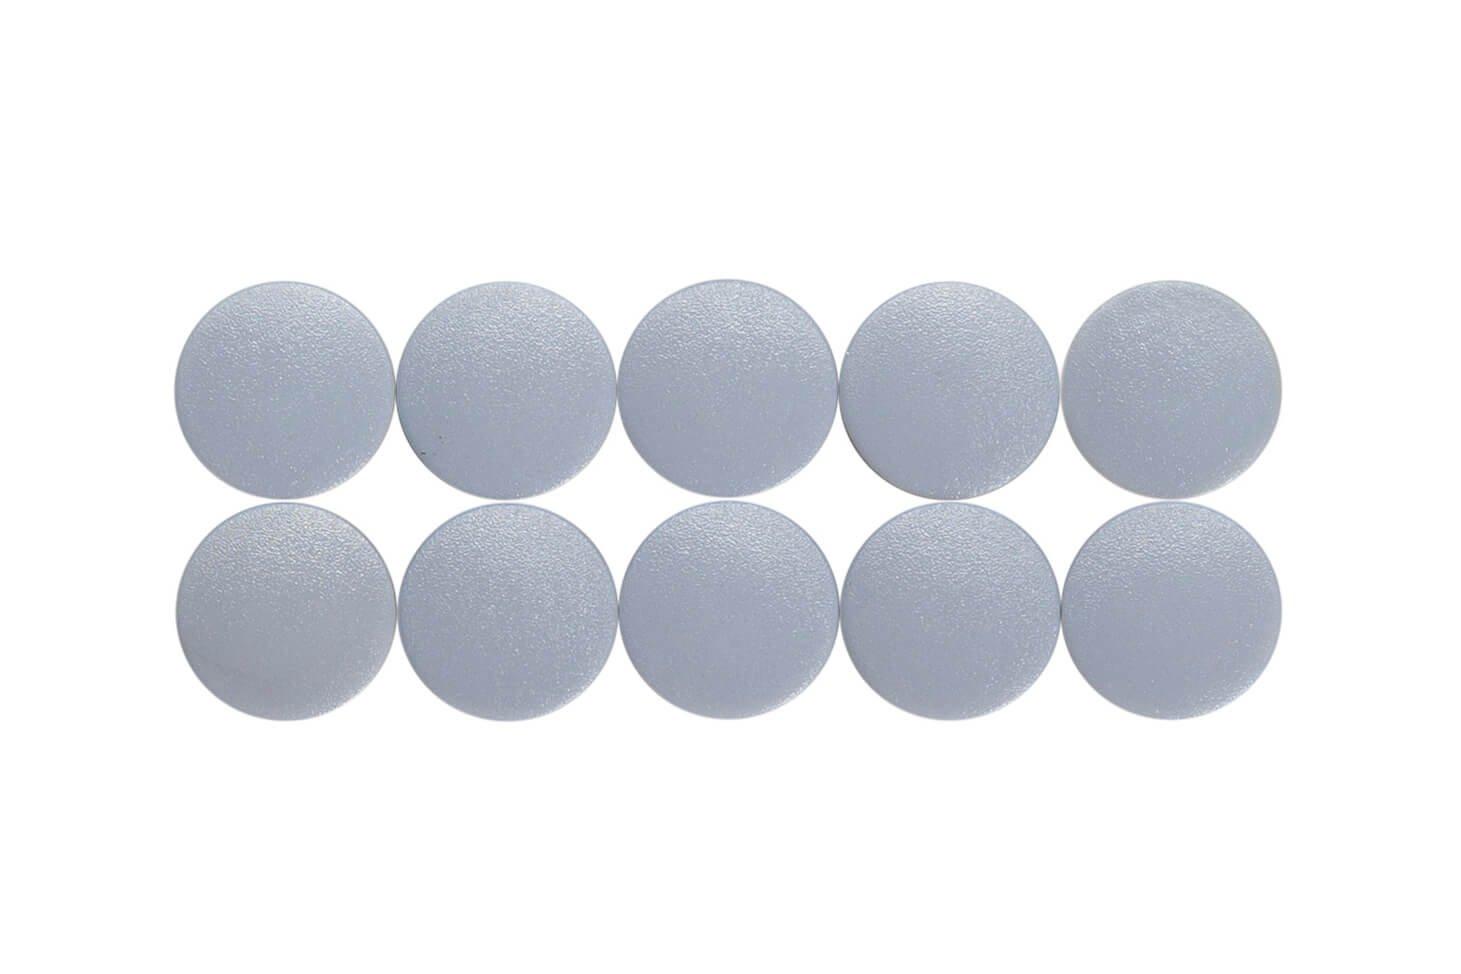 Magnet MAULsolid Ø 15 mm, 0,15 kg Haftkraft, 10 St/Ktn., grau